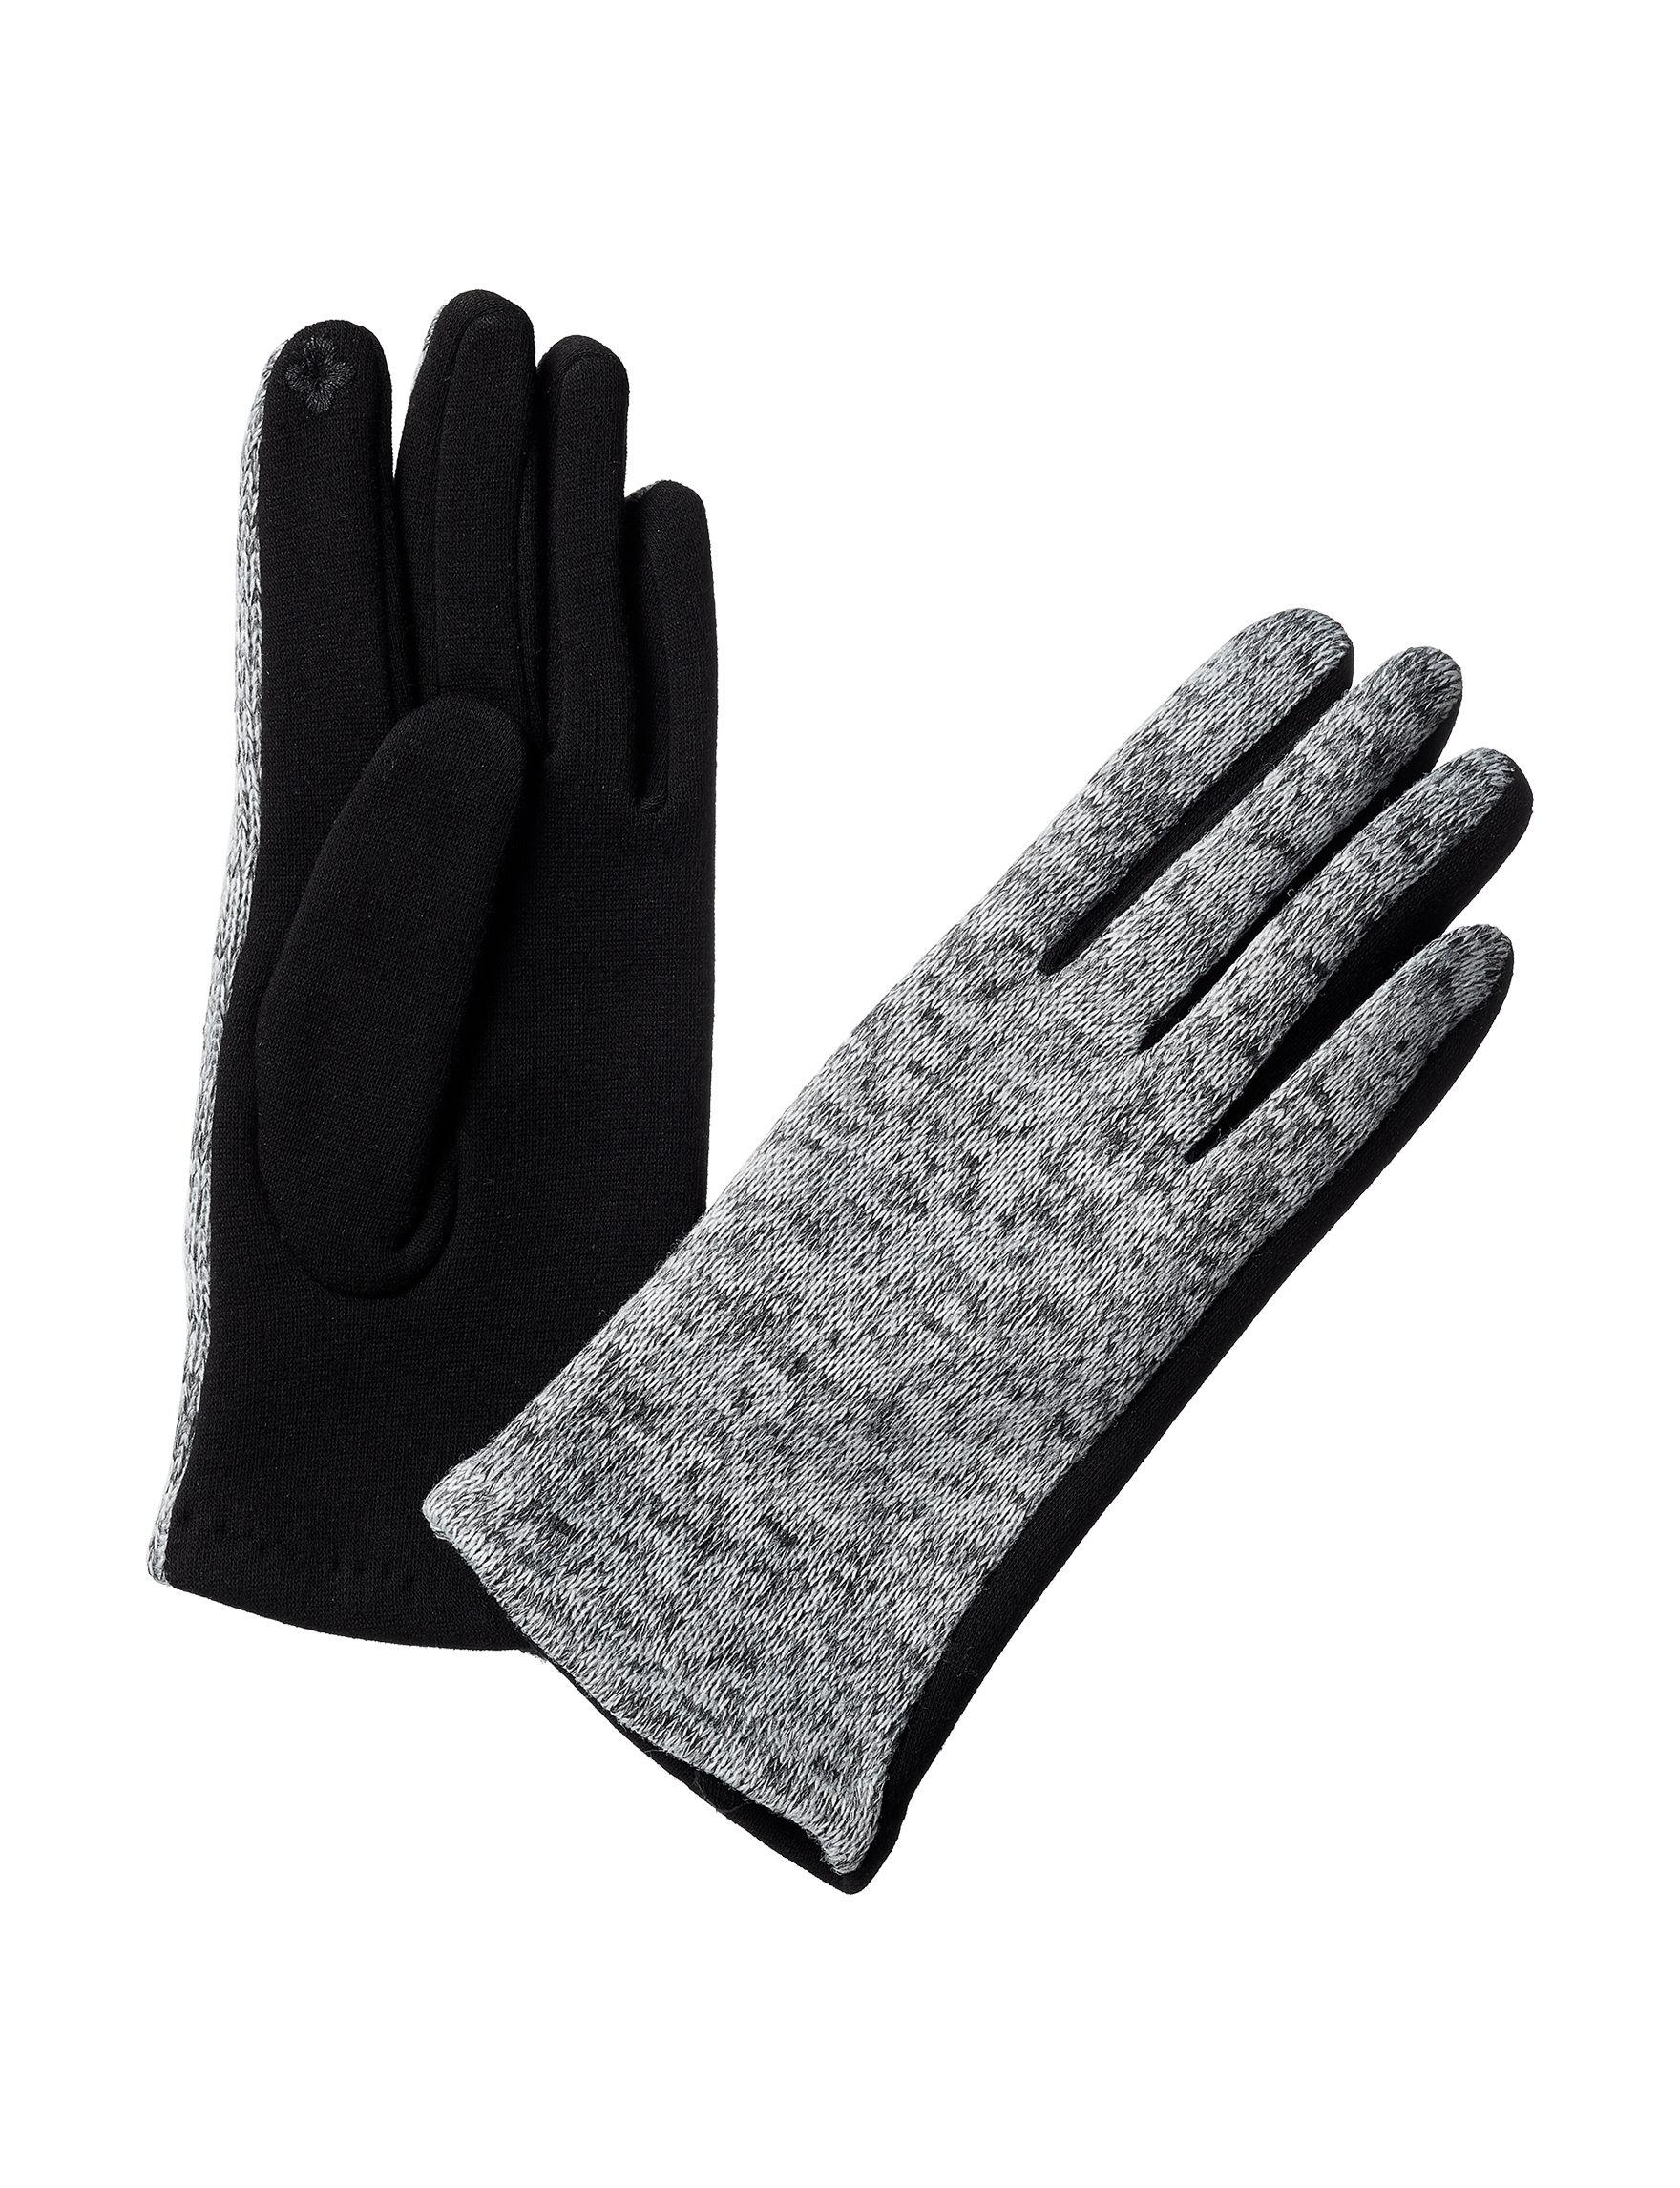 GII Grey / Black Gloves & Mittens